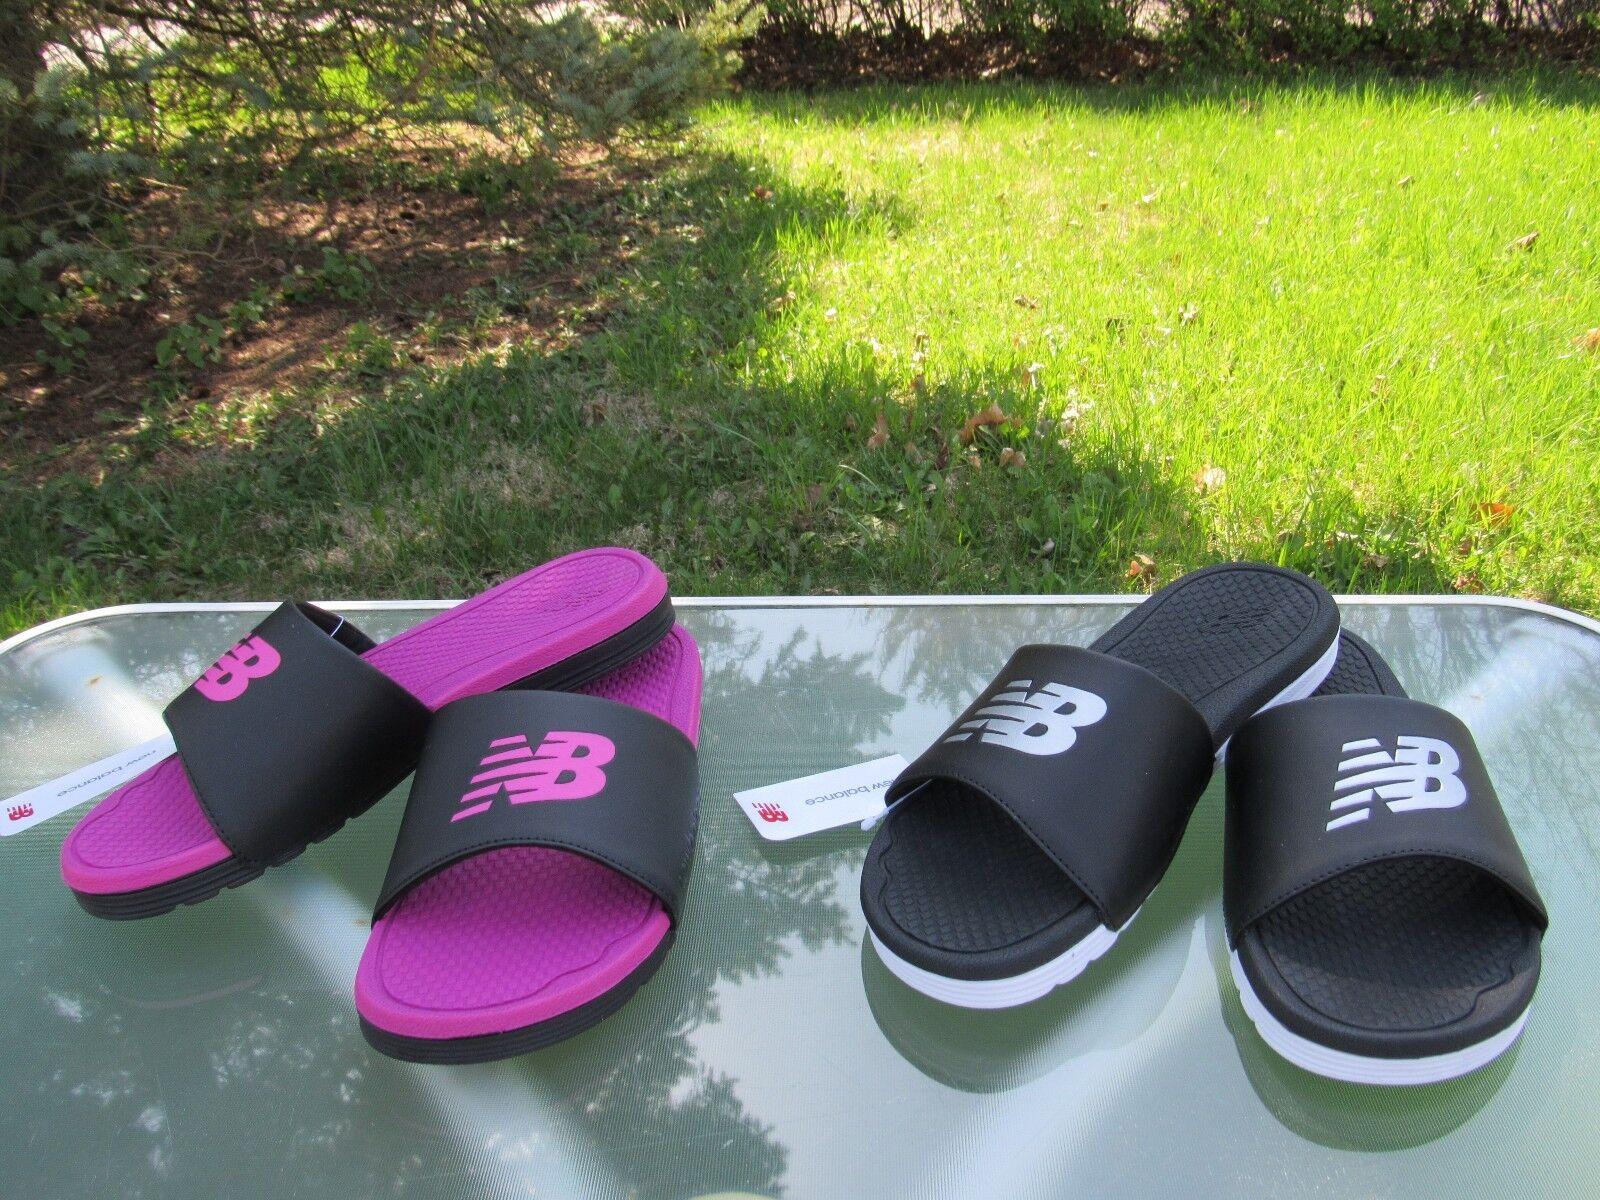 New Balance Comfort Lightweight Slides Sandals Black/Pink & Black/White size 9